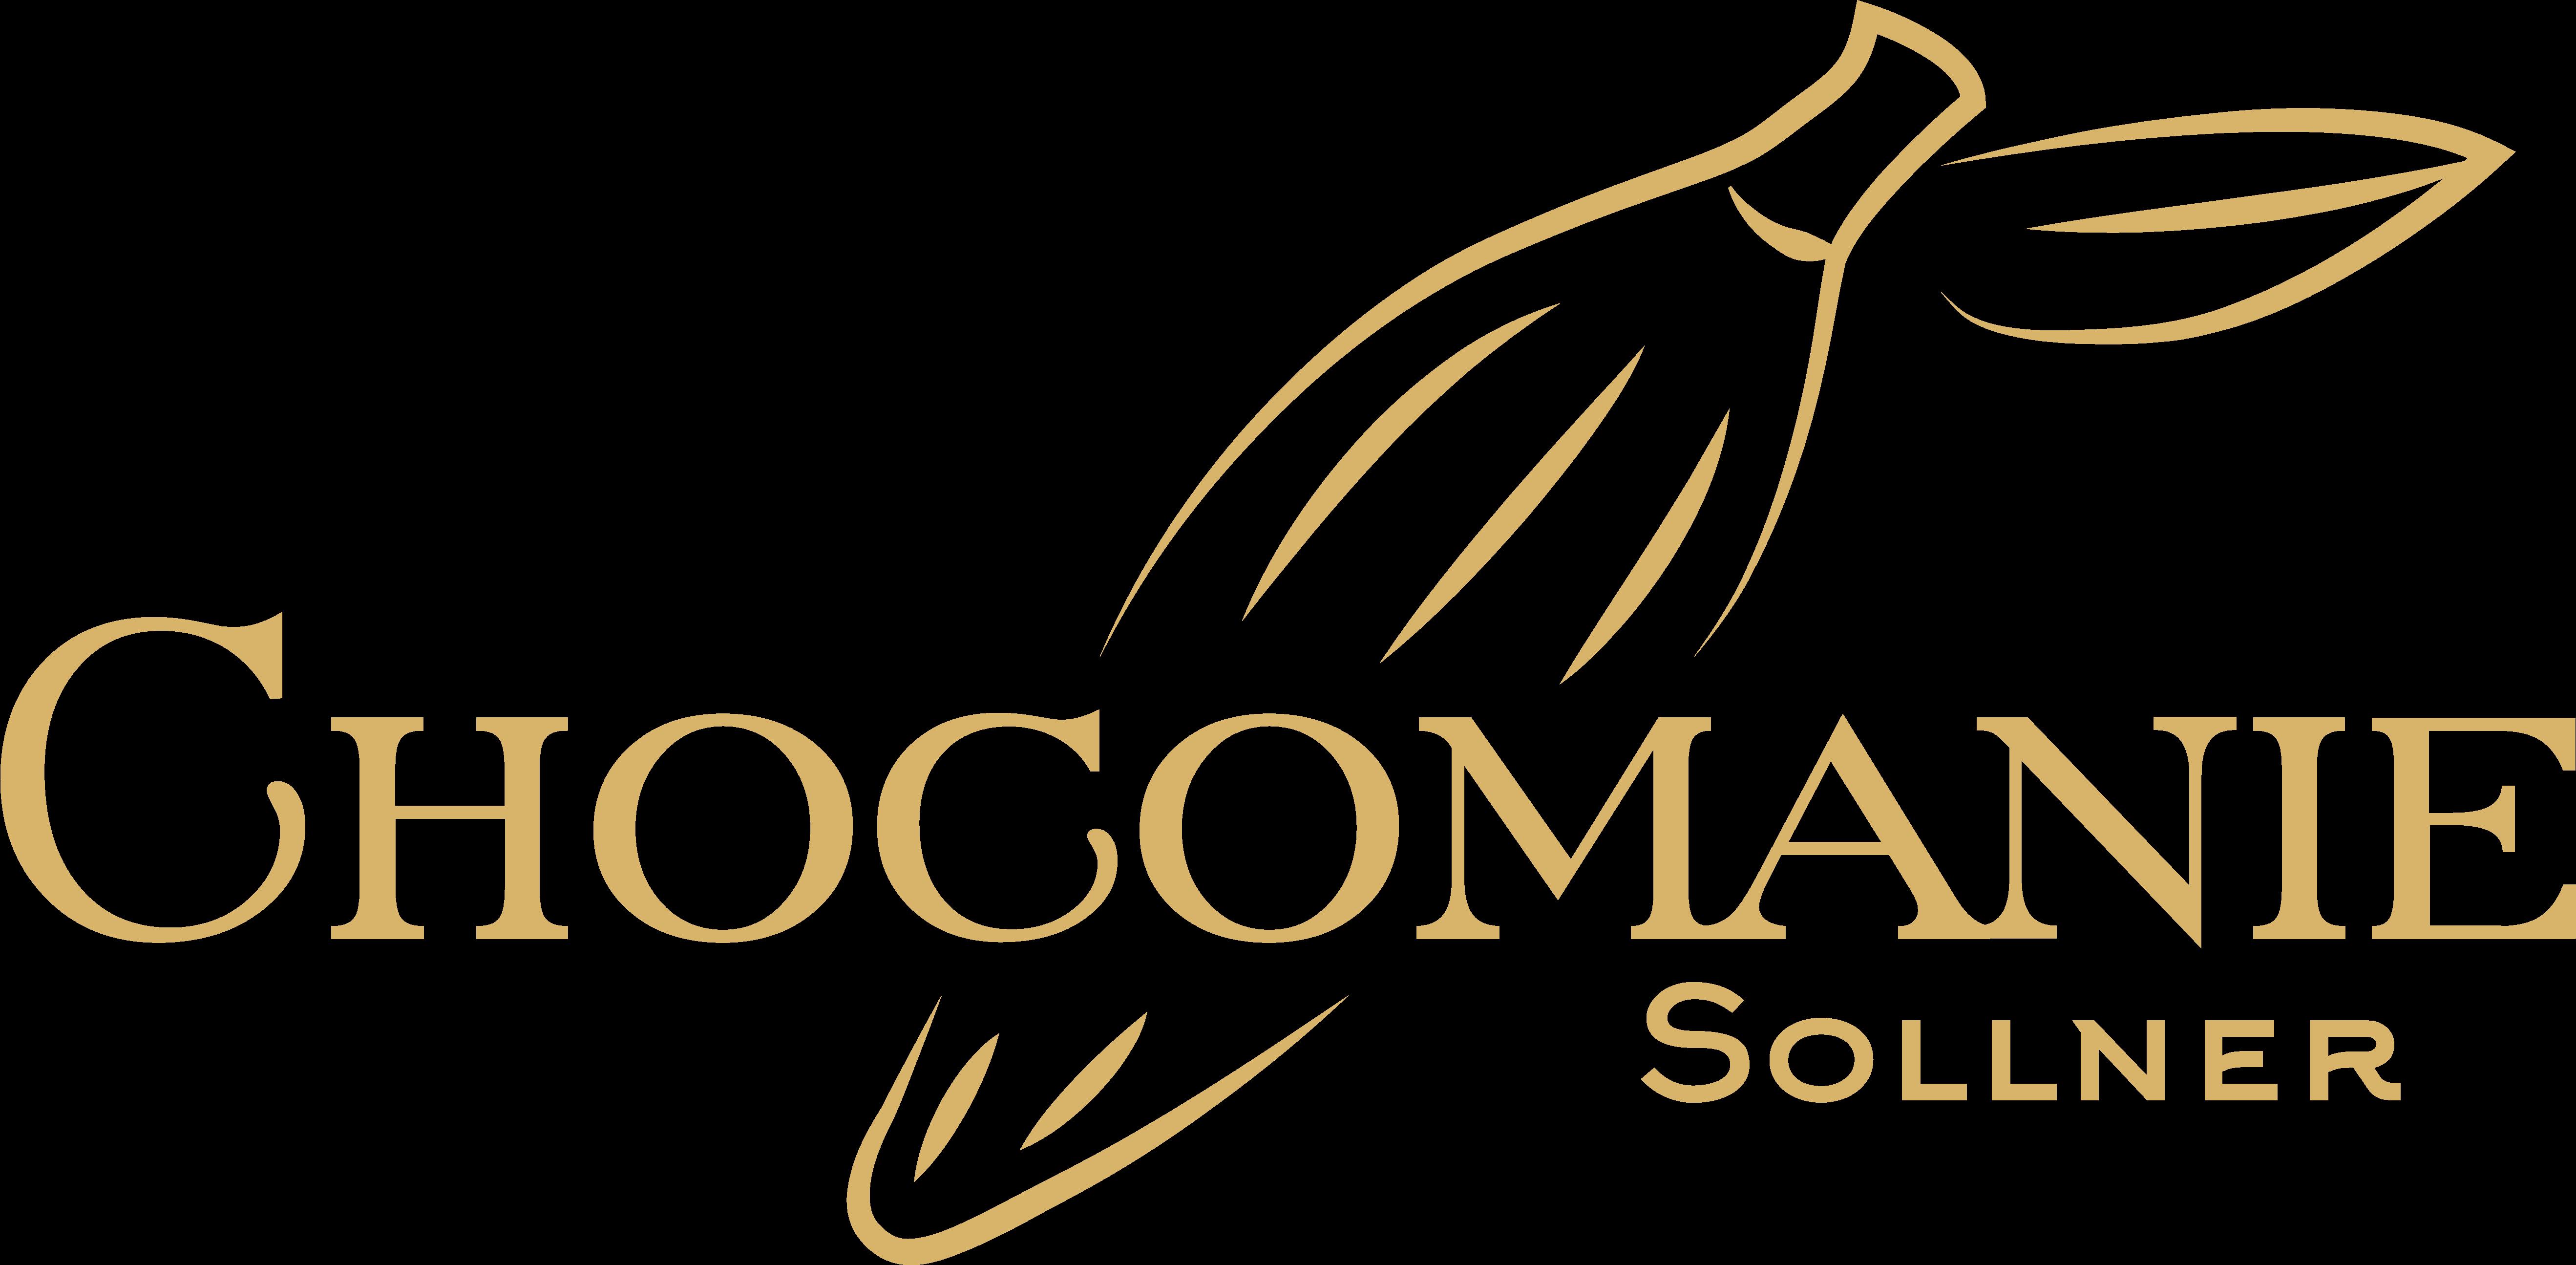 Chocomanie